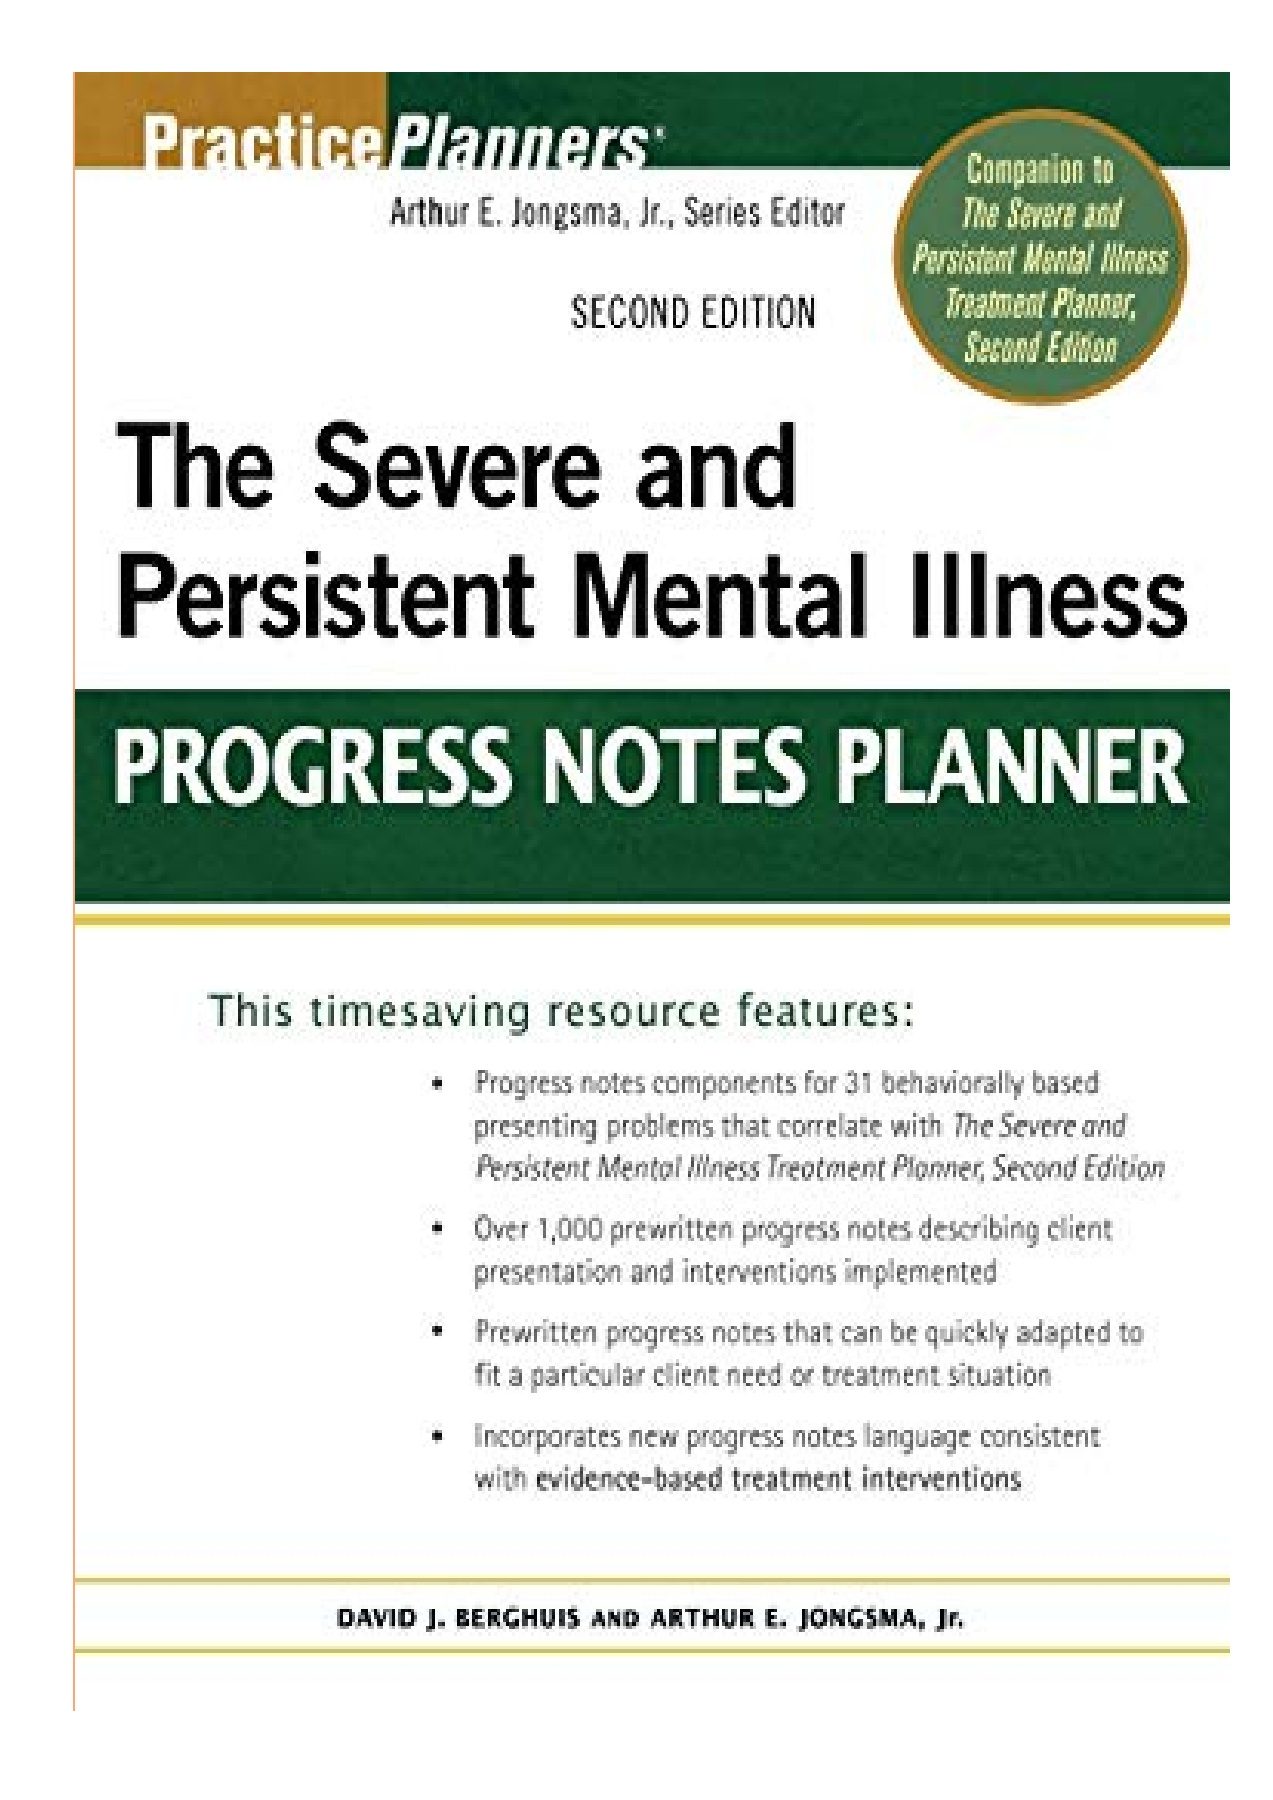 Progress Notes Planner Pdf